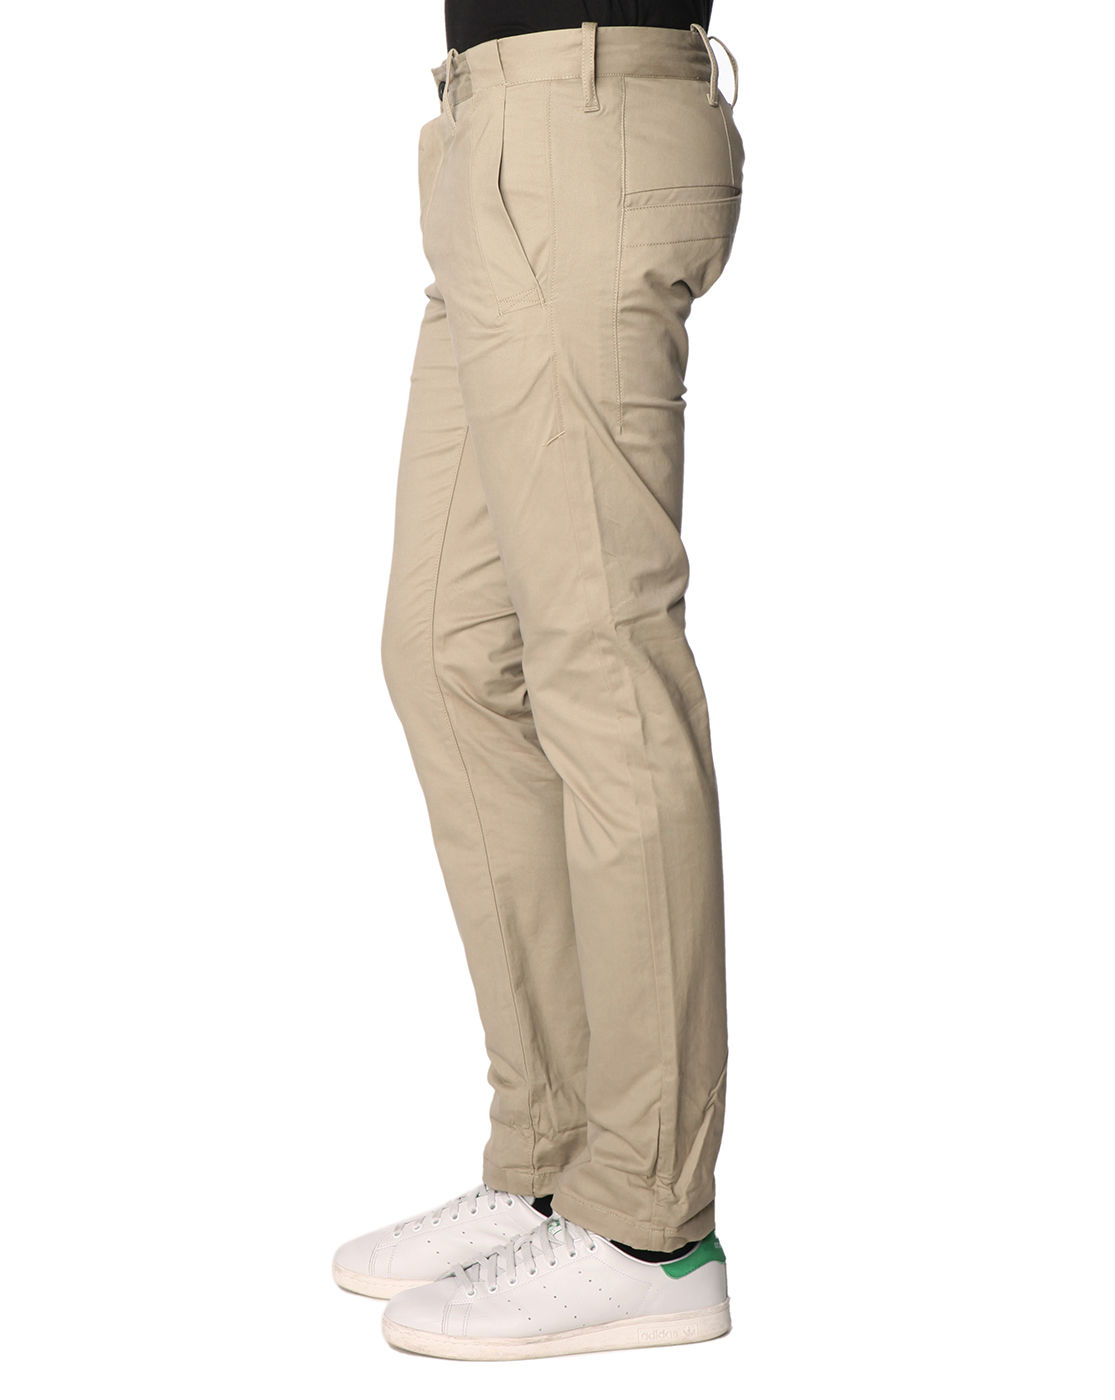 g star raw bronson beige slim fit chinos in beige for men. Black Bedroom Furniture Sets. Home Design Ideas